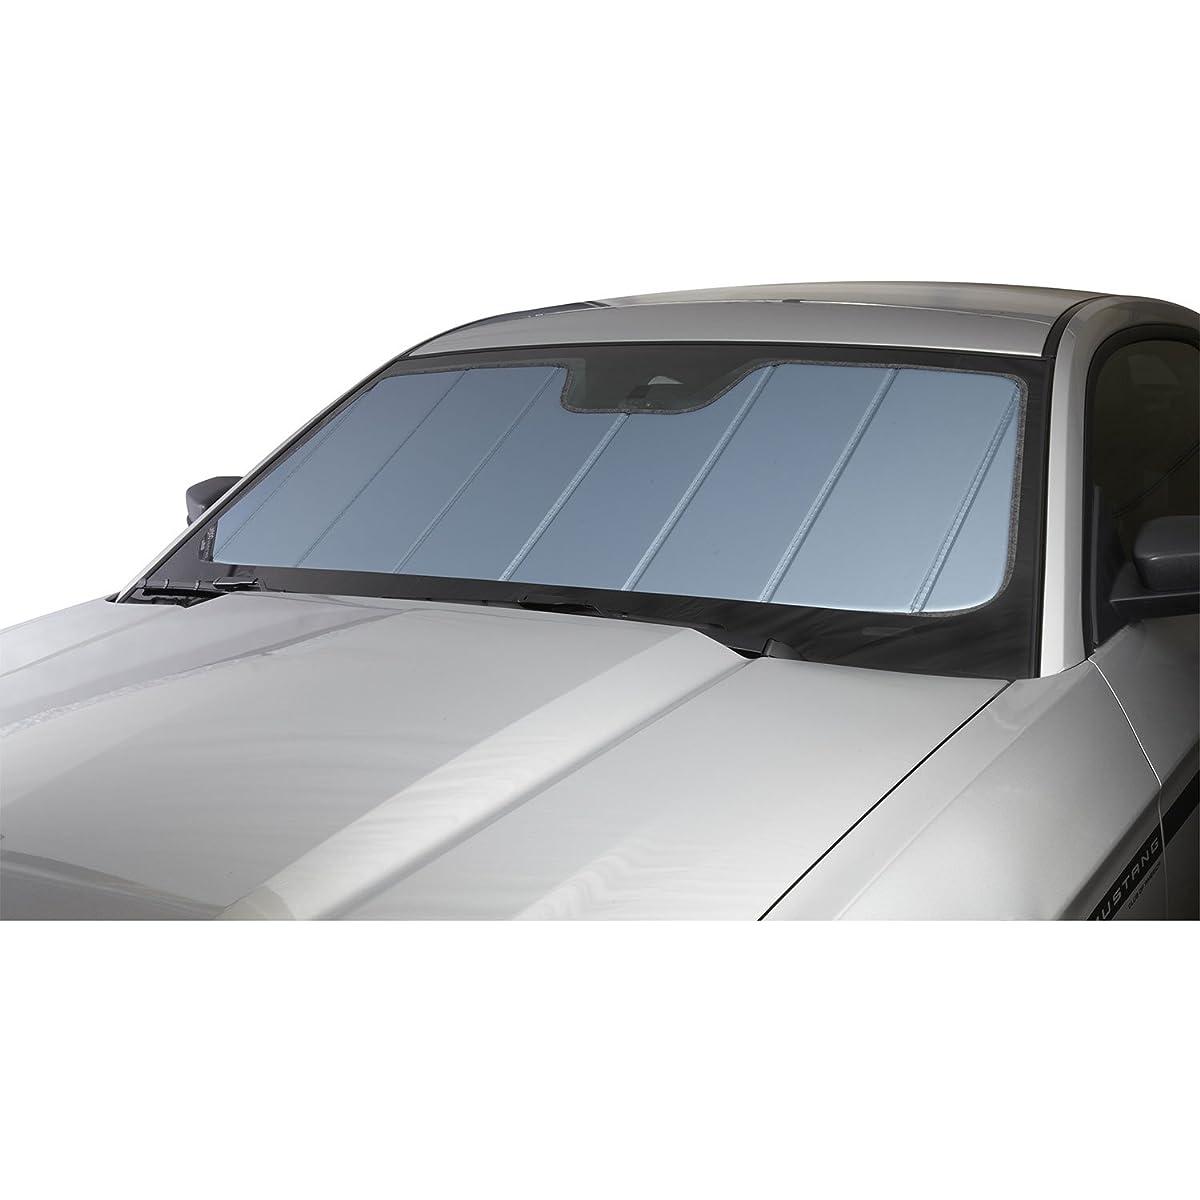 Covercraft UV10166BL Blue Metallic UVS 100 Custom Fit Sunscreen for Select Ford Mustang Models - Laminate Material, 1 Pack